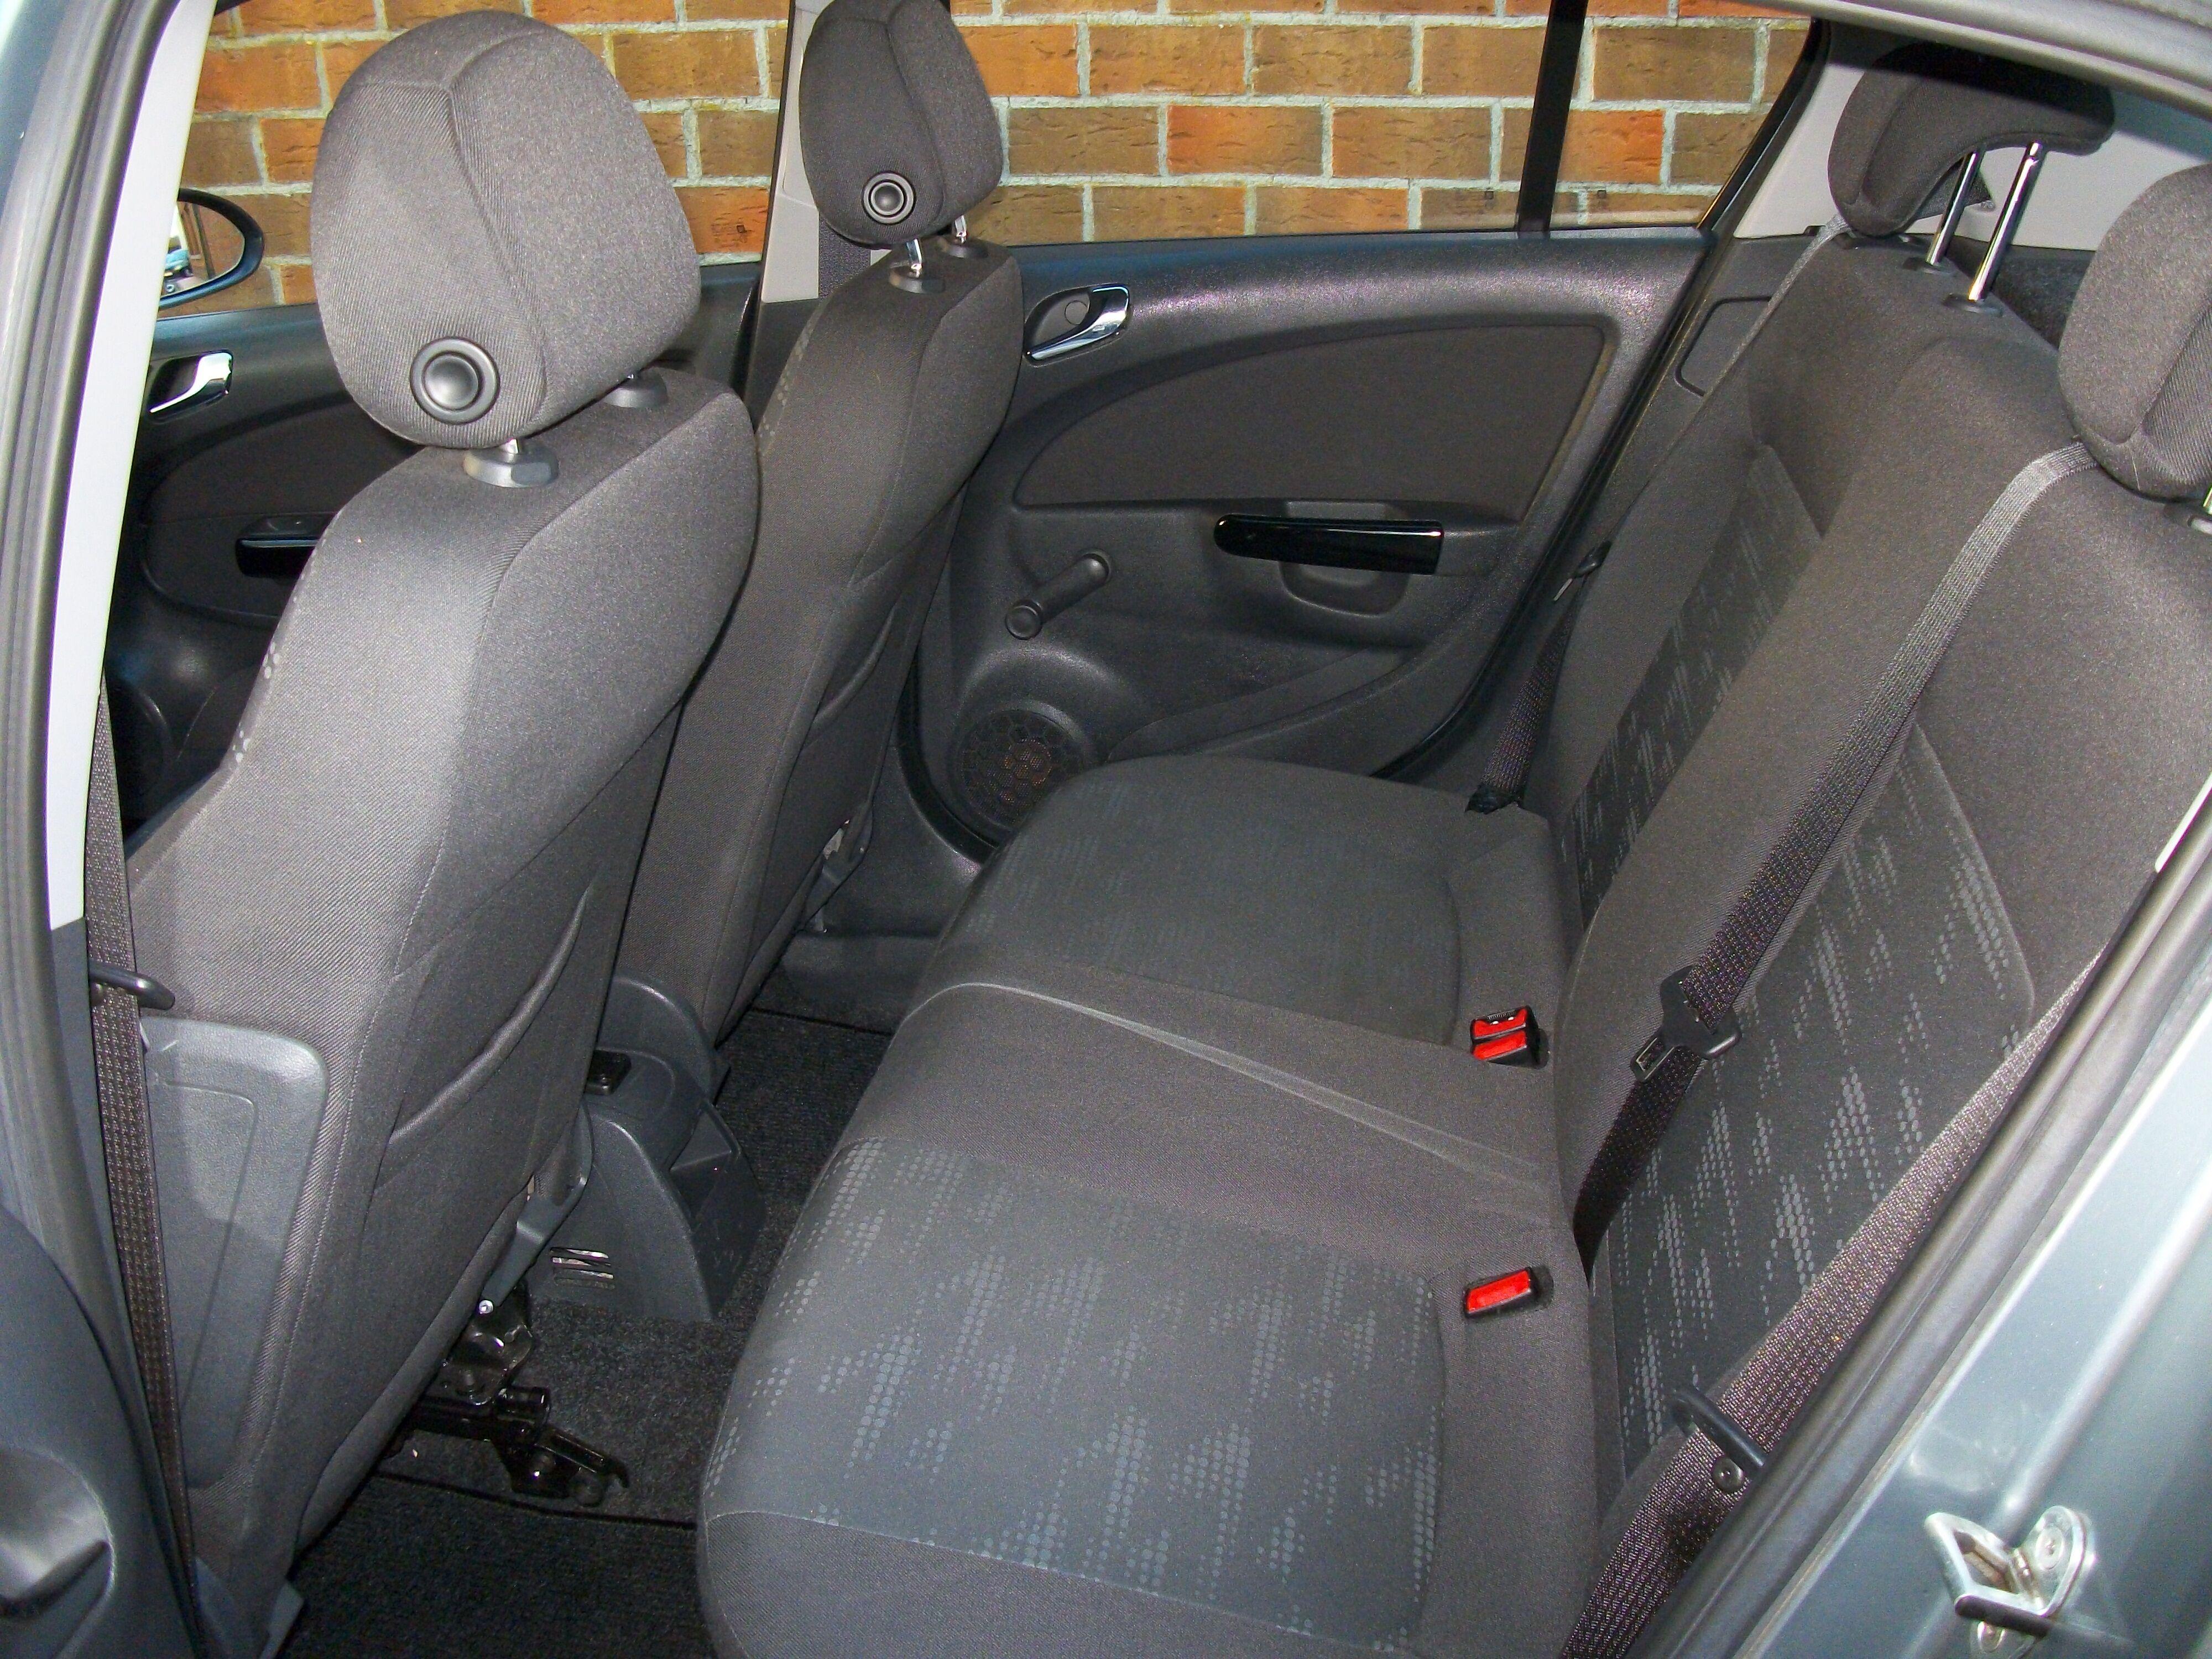 Opel CORSA - 2011 1.2 Benz - weinig kilometers 8/11